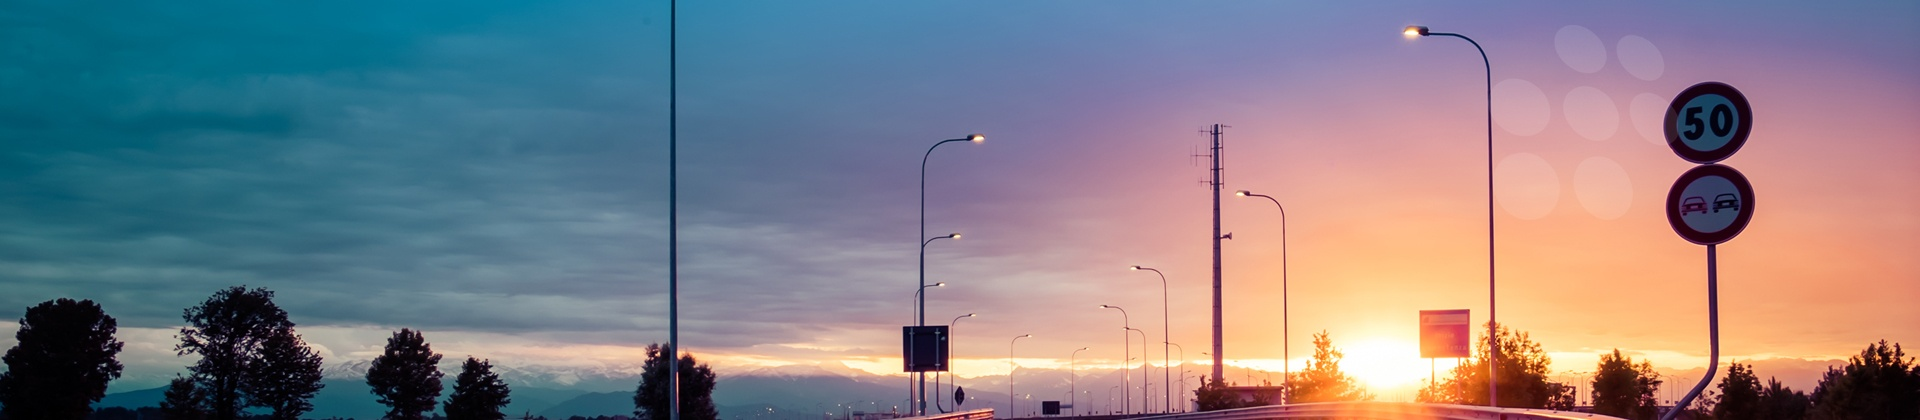 Smart Street and Roadway Lighting Controls